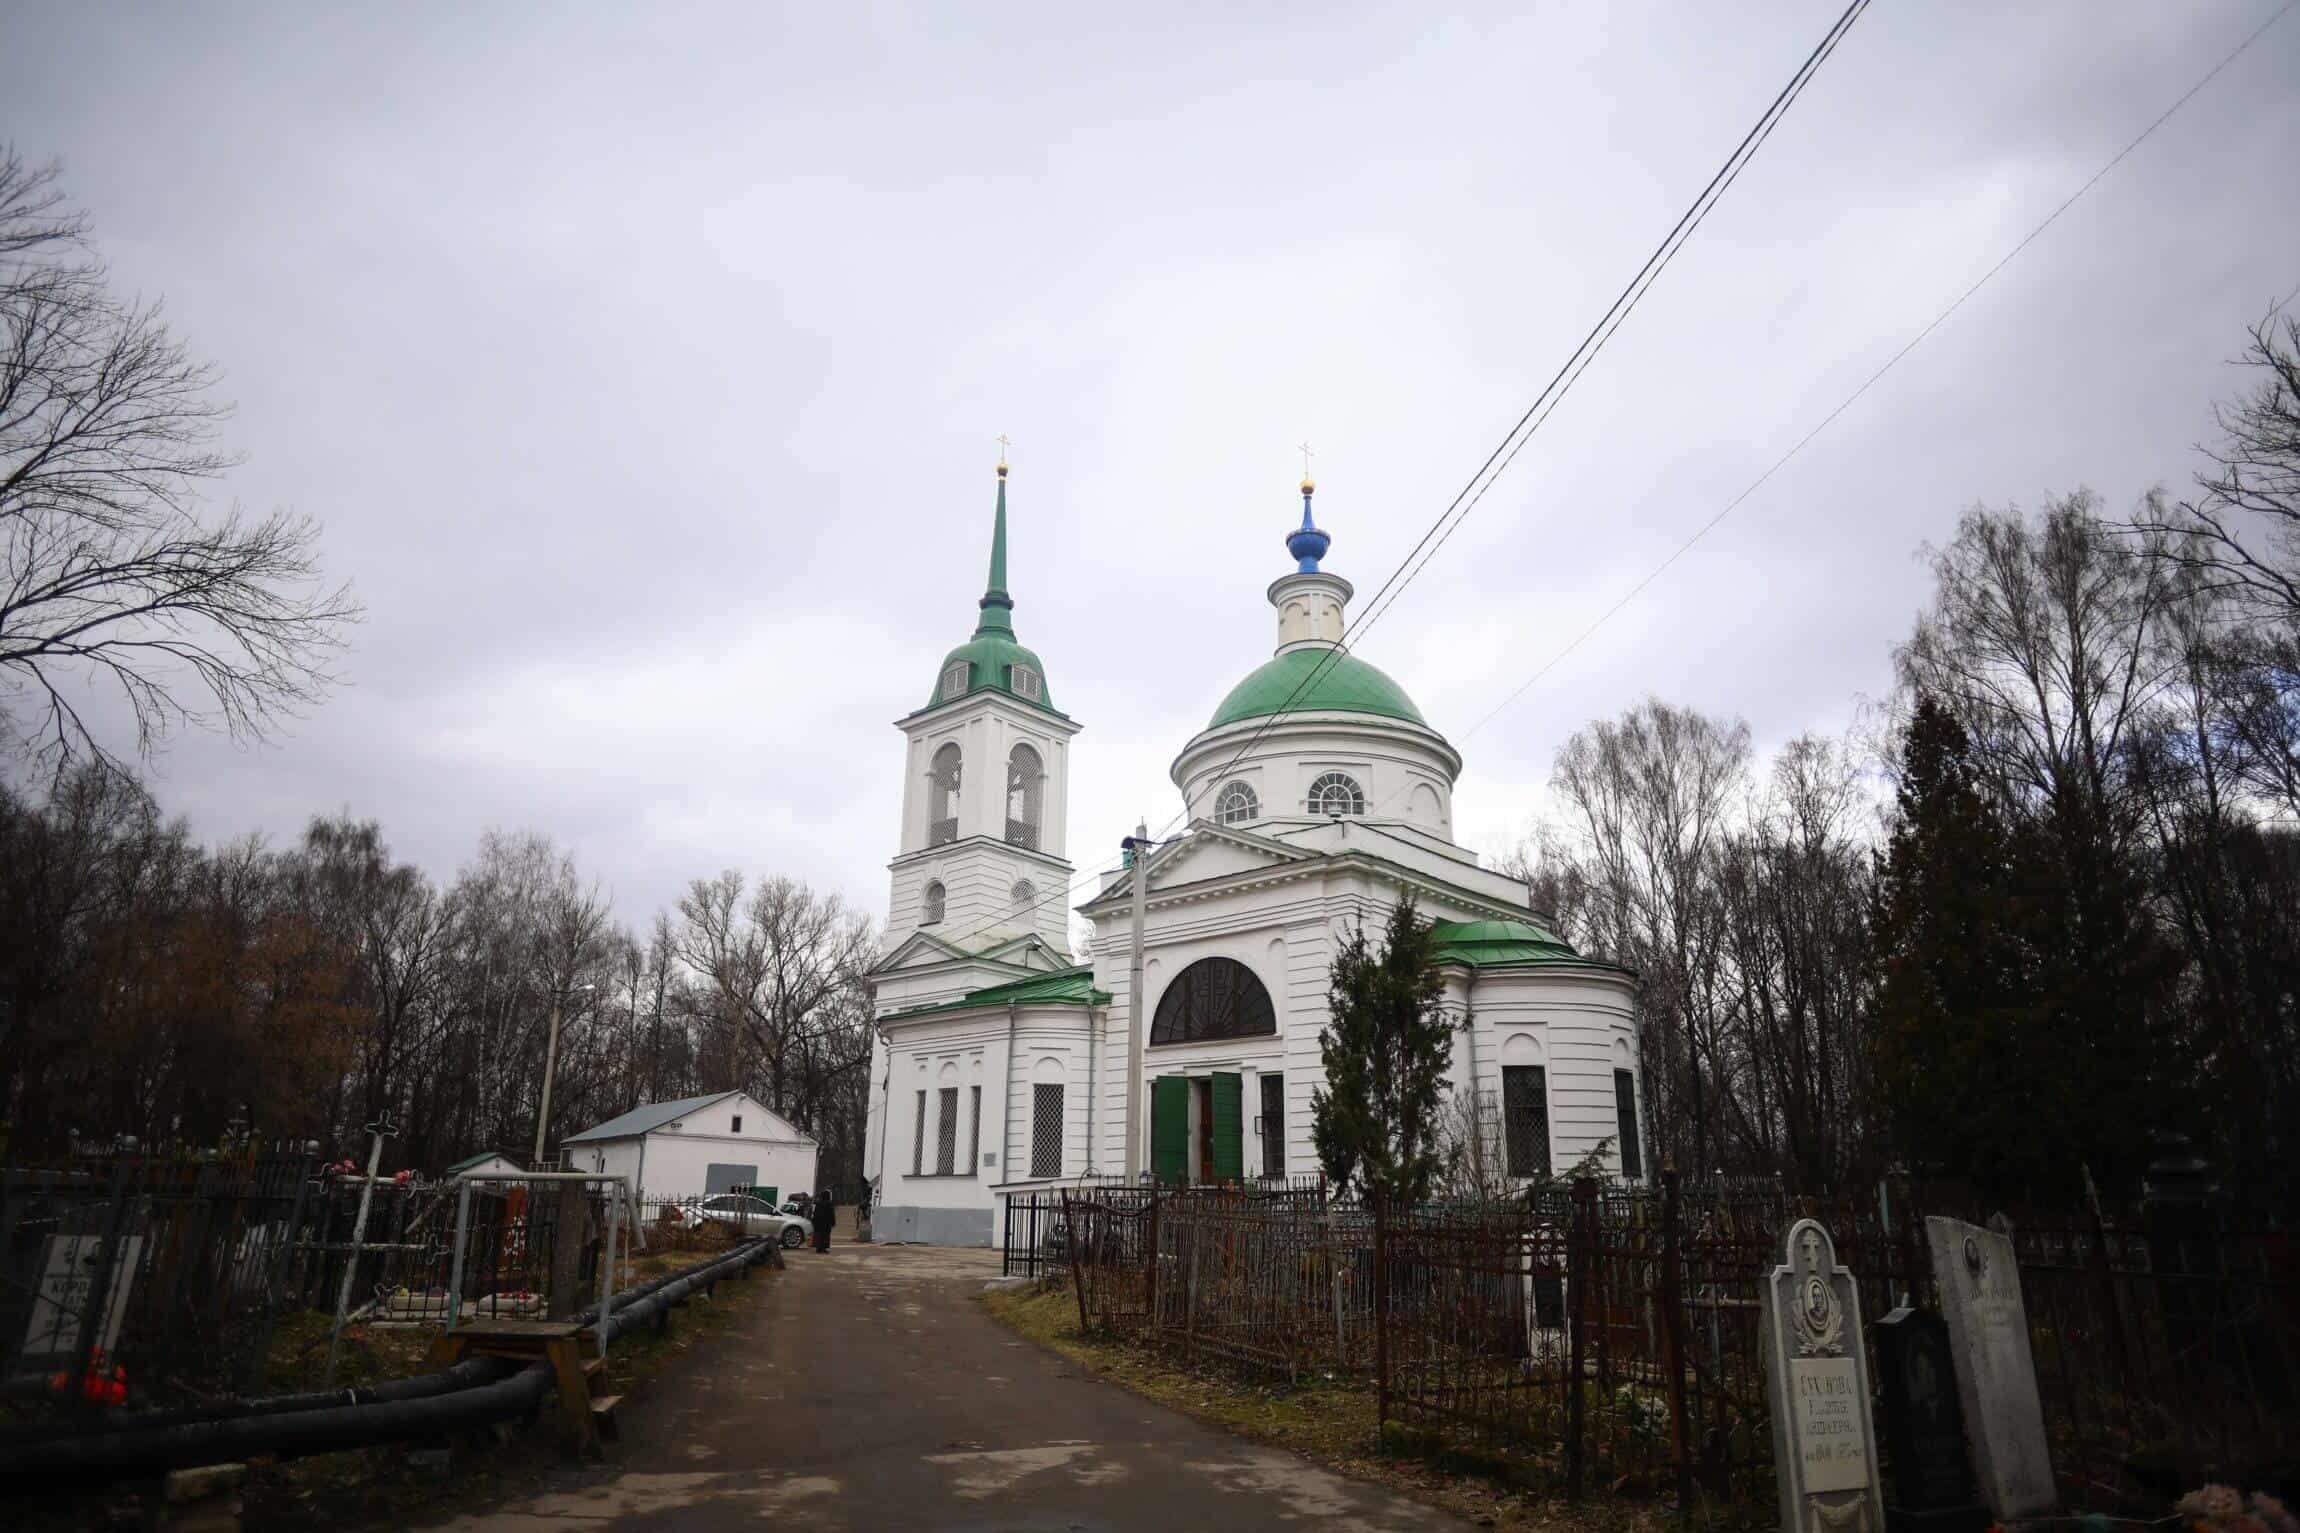 Спасское кладбище г. Тулы. Фото нач. 2010-х гг.